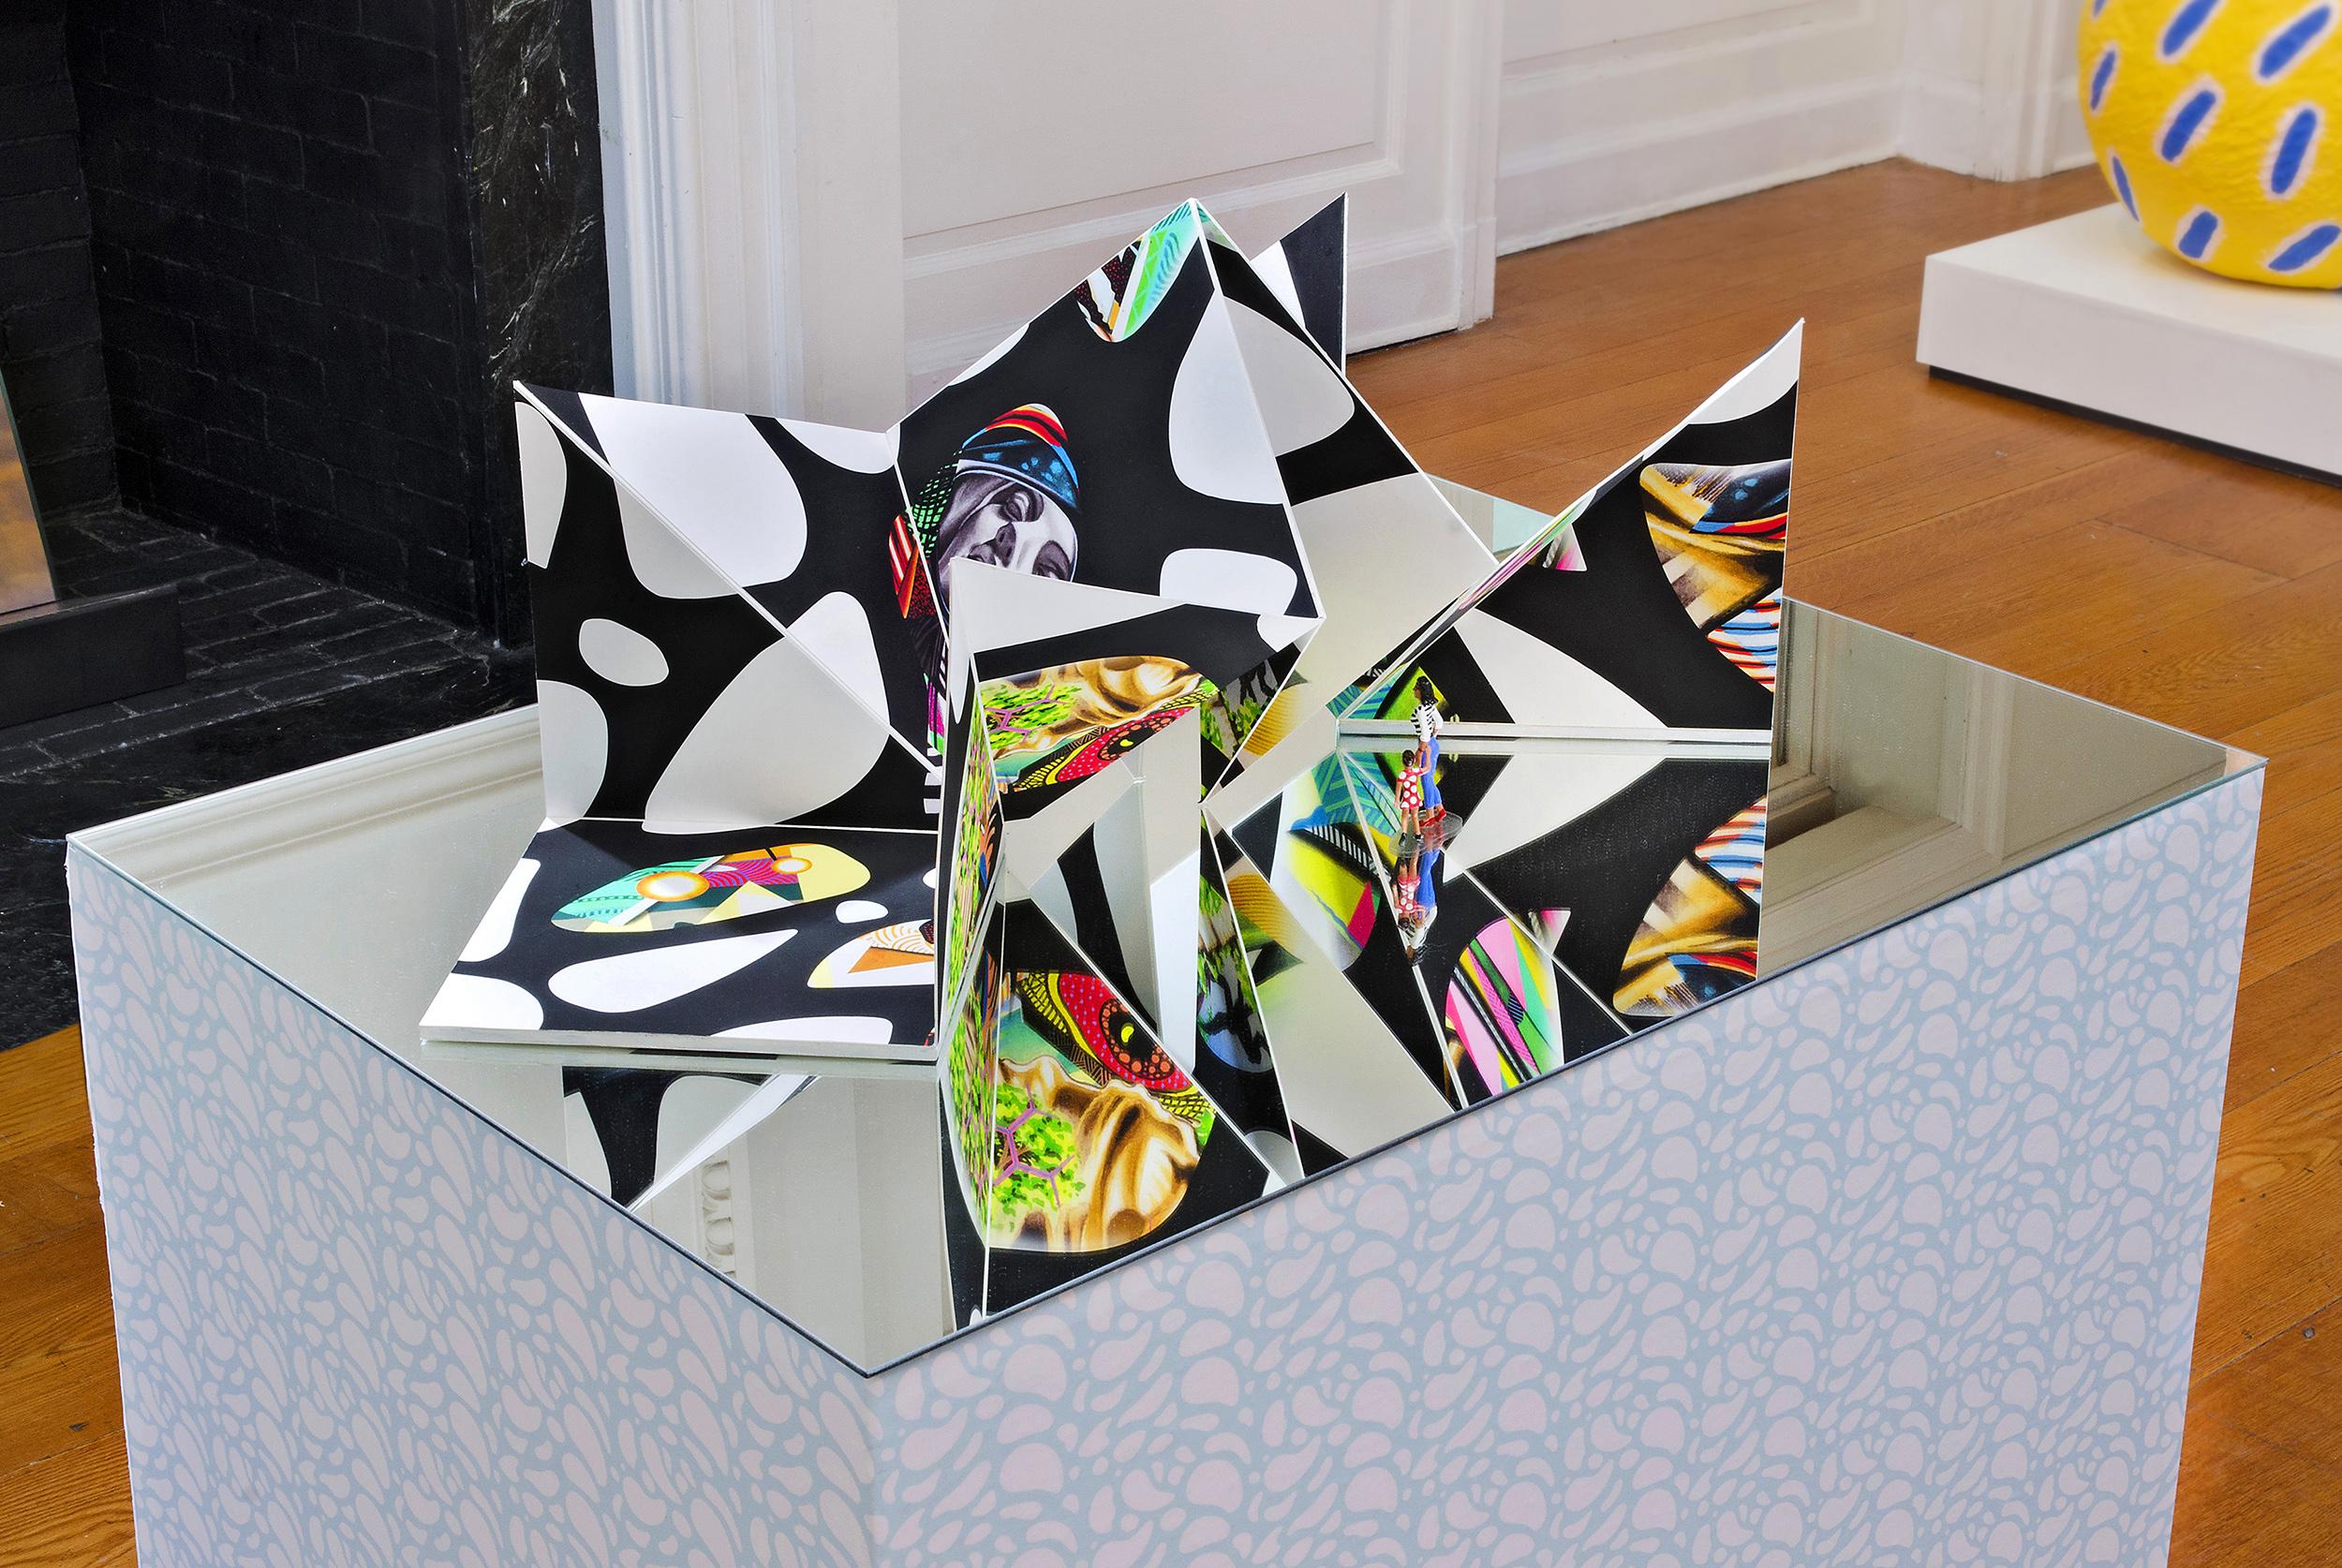 Ventana Origami Sculpture: Installation View (Photo: Stefan Hagen)